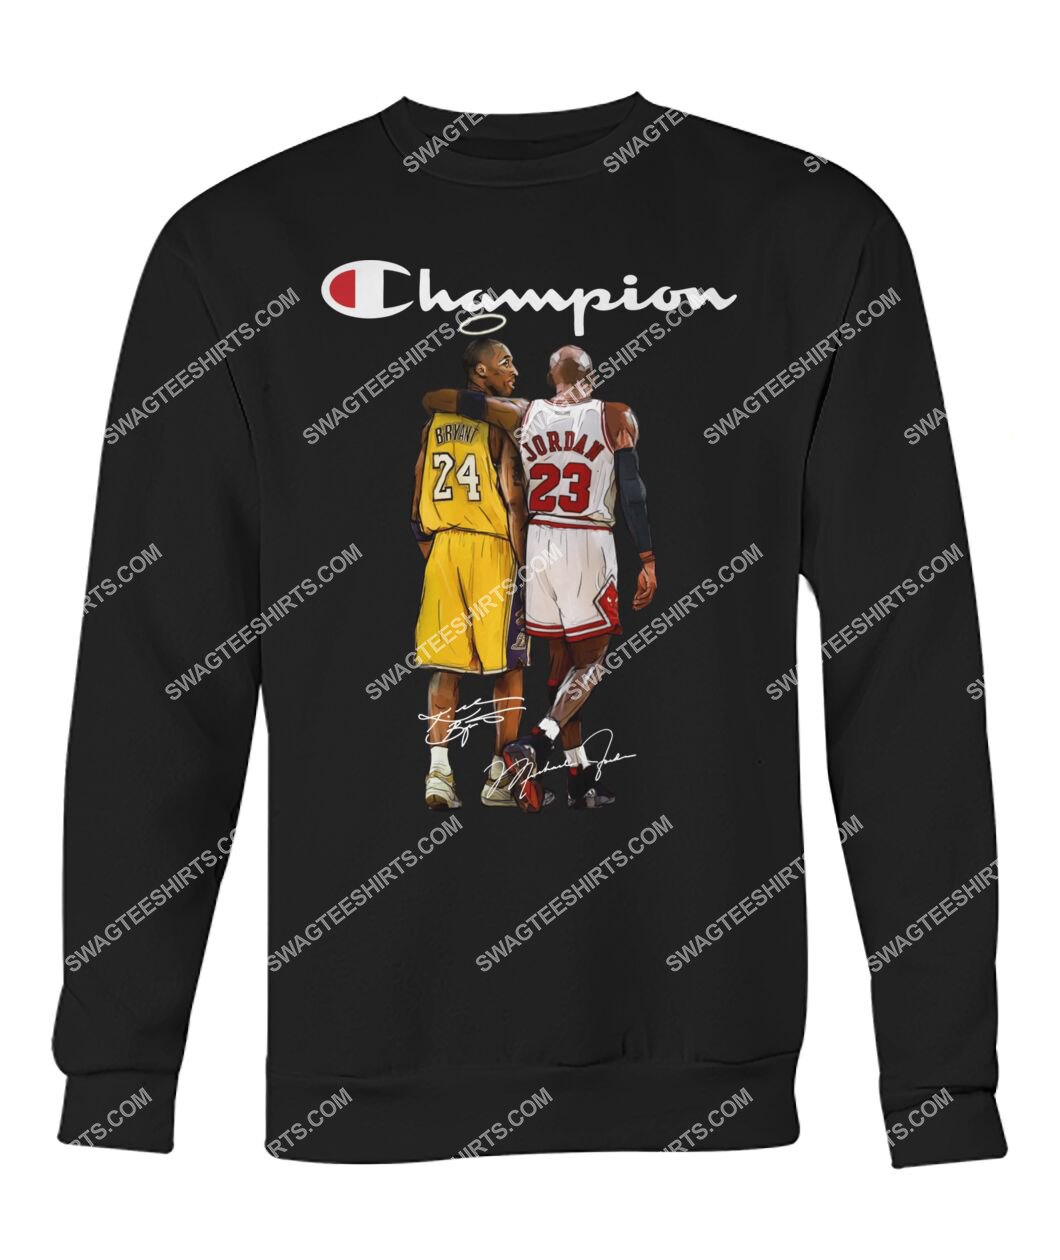 champion kobe bryant and michael jordan signature sweatshirt 1